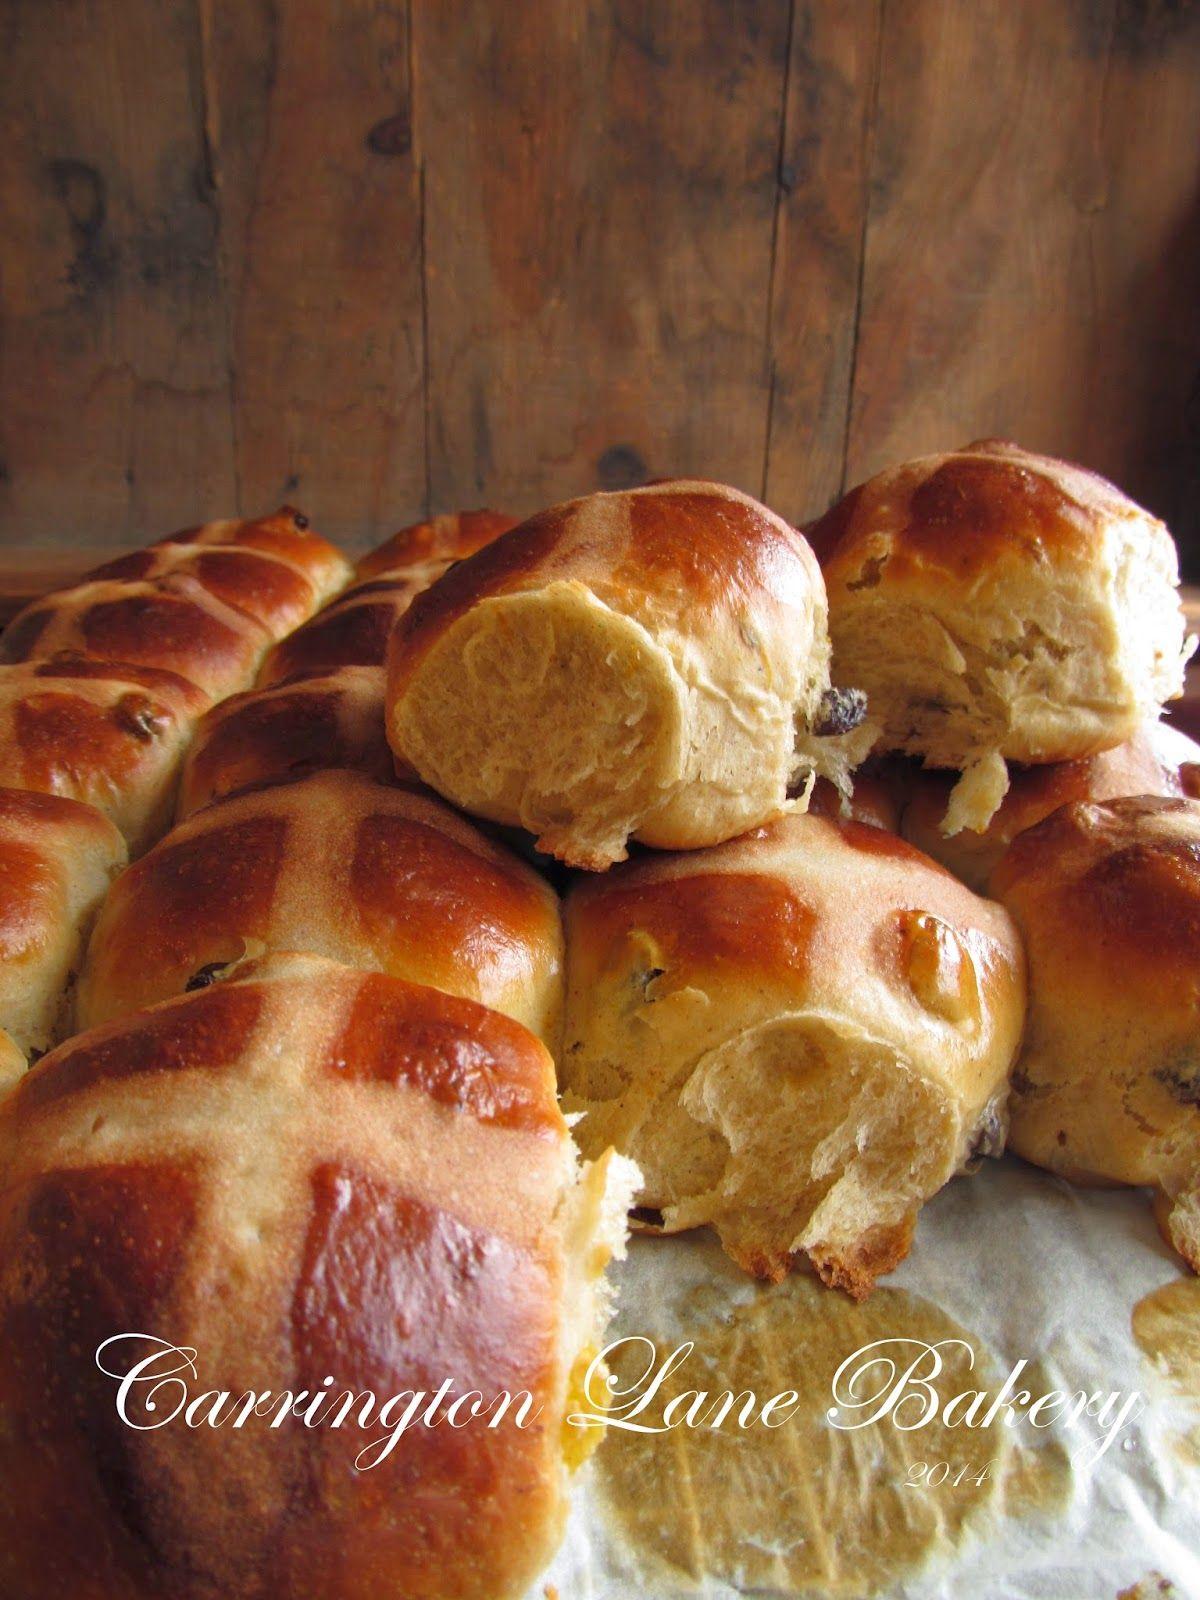 Carrington Lane Bakery: Hot Cross Buns